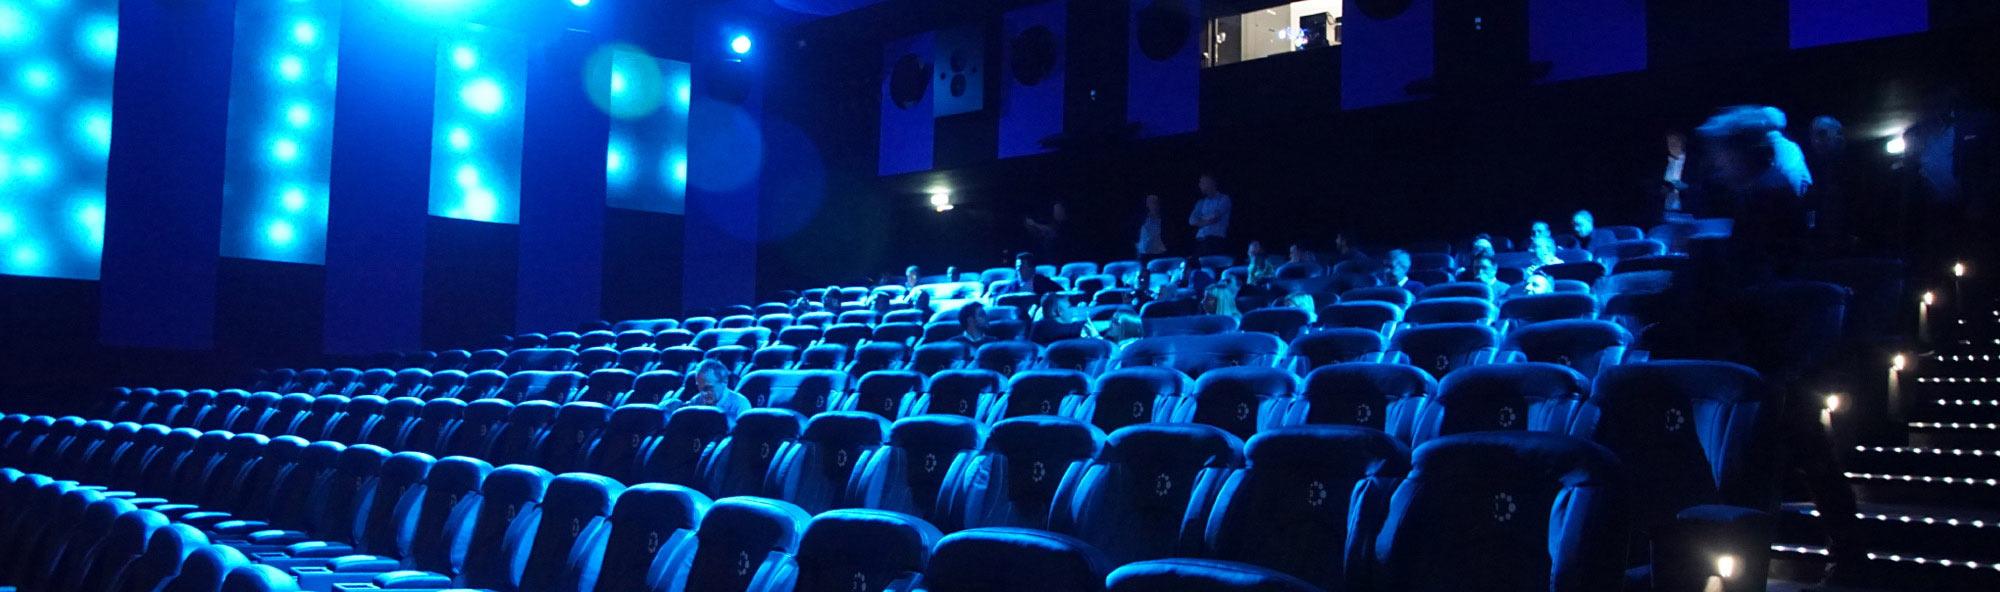 VLS CGR Cinema Image 3 – Photo credits : ©CGR Cinemas